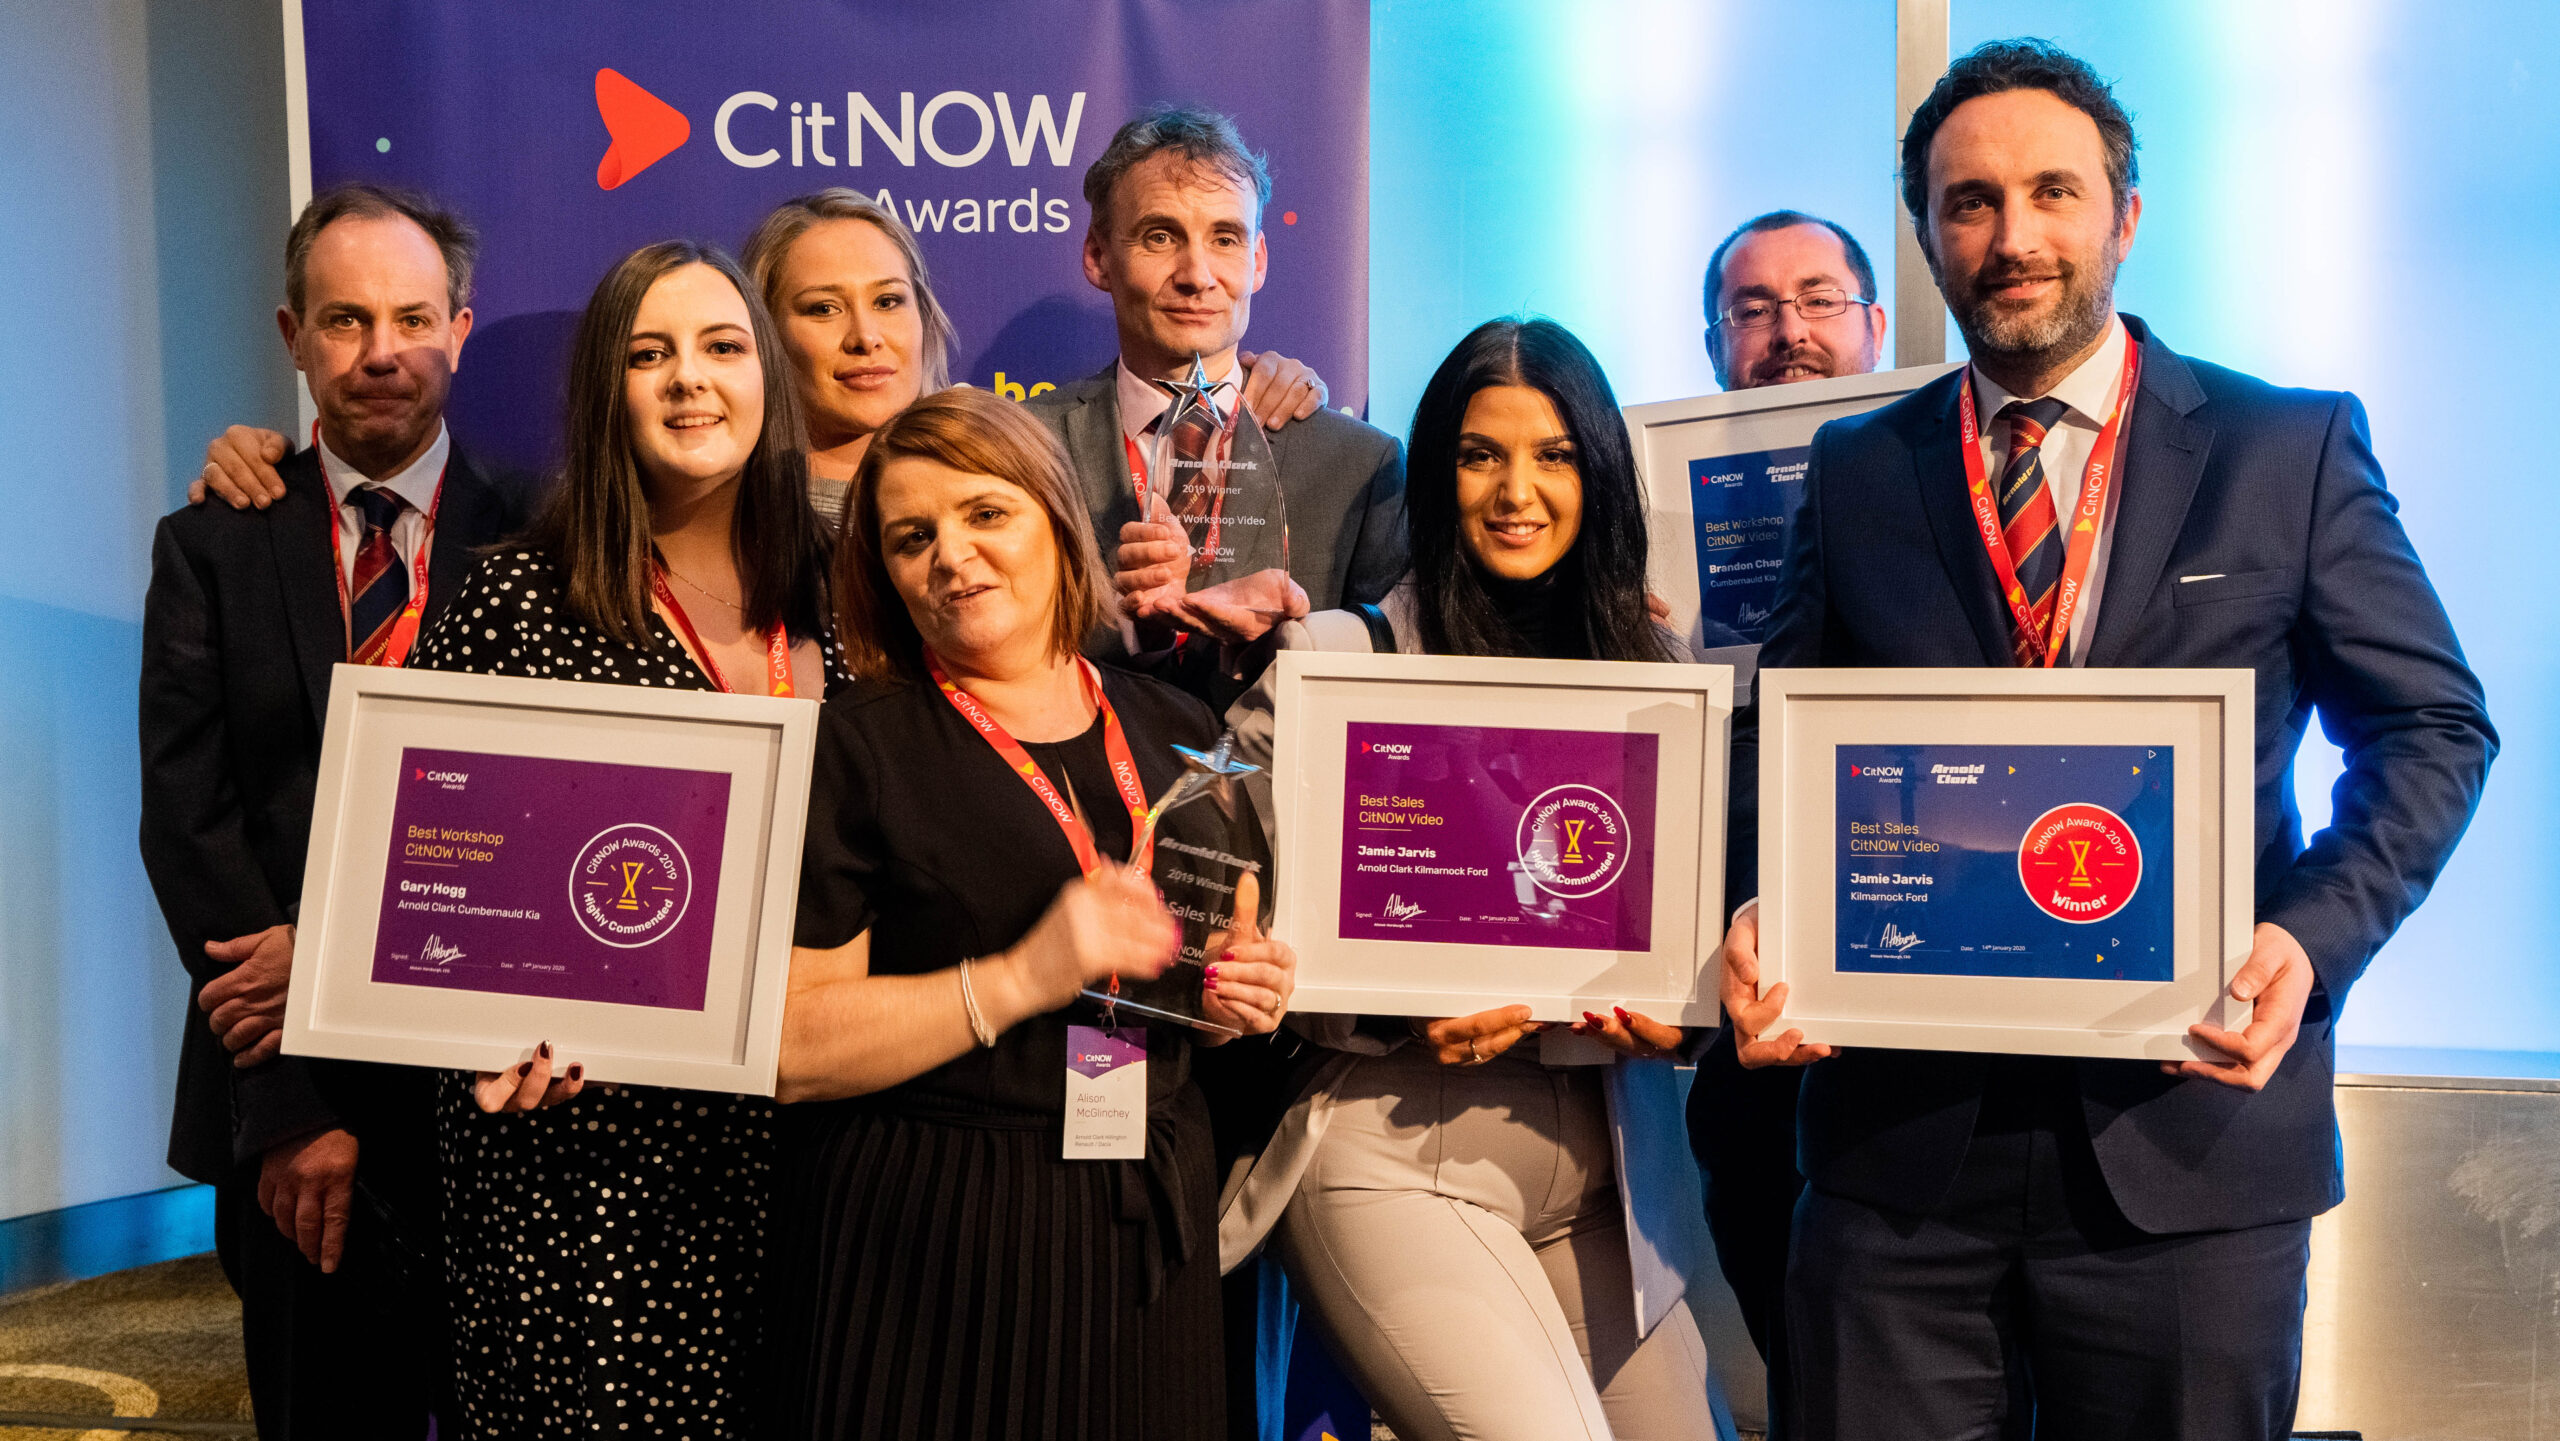 Awards Winners Group photo